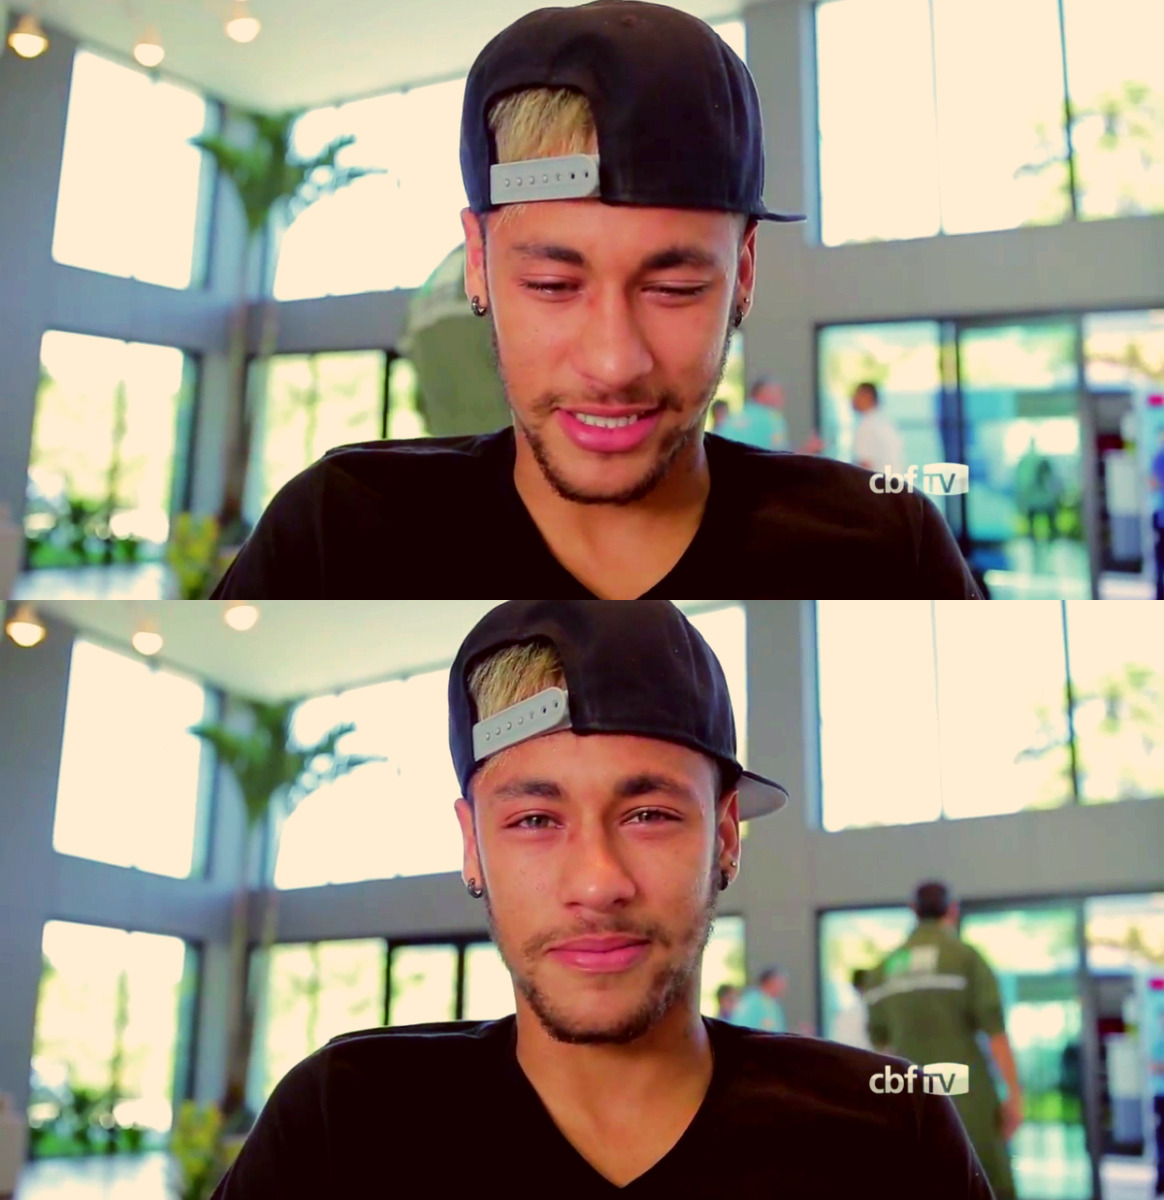 Neymar Jr. Tumblr_n89d7097fN1qf6vhlo3_1280